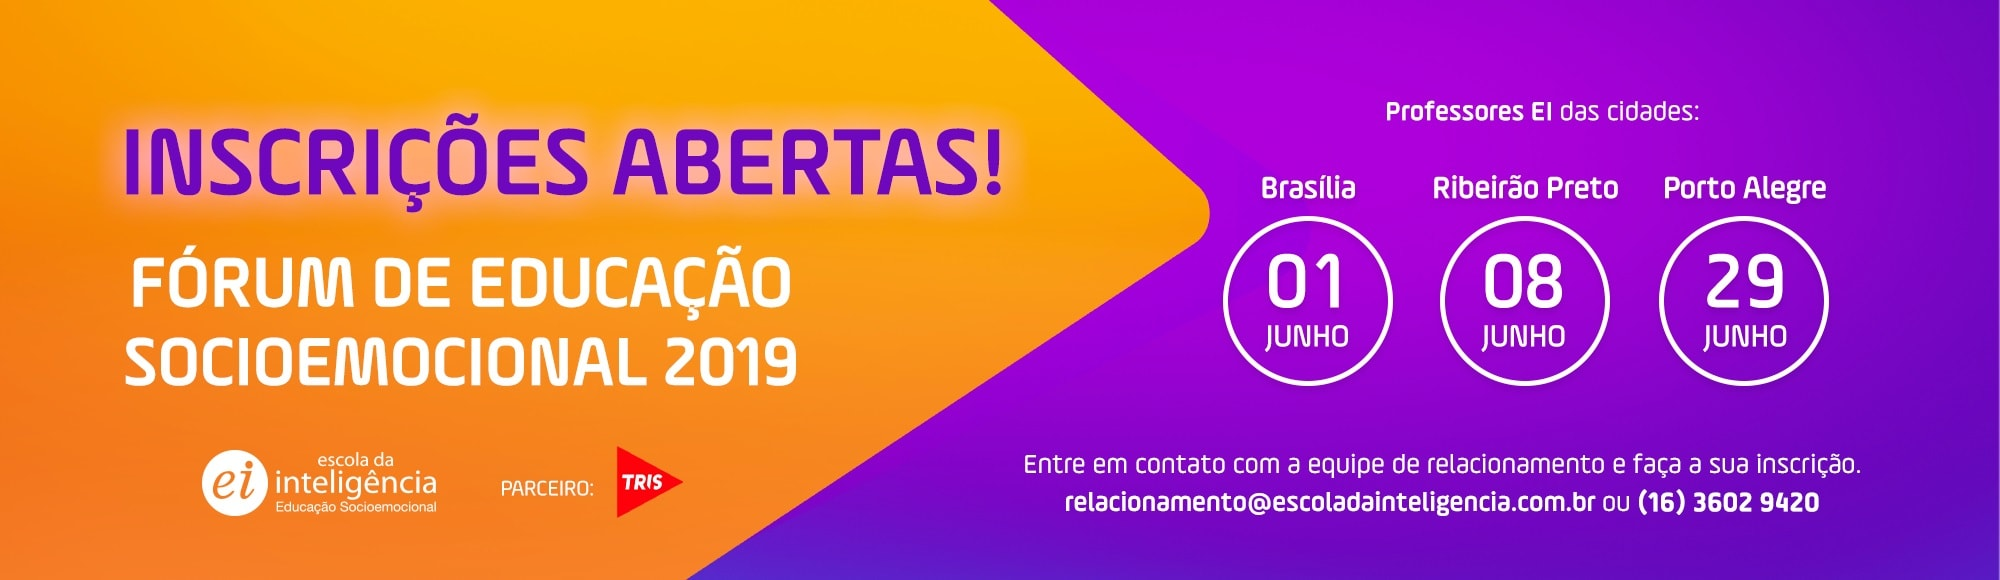 banner_inscricoes_forum_de_educacao_socioemocional_2019_brasilia_ribeirao_porto_algre